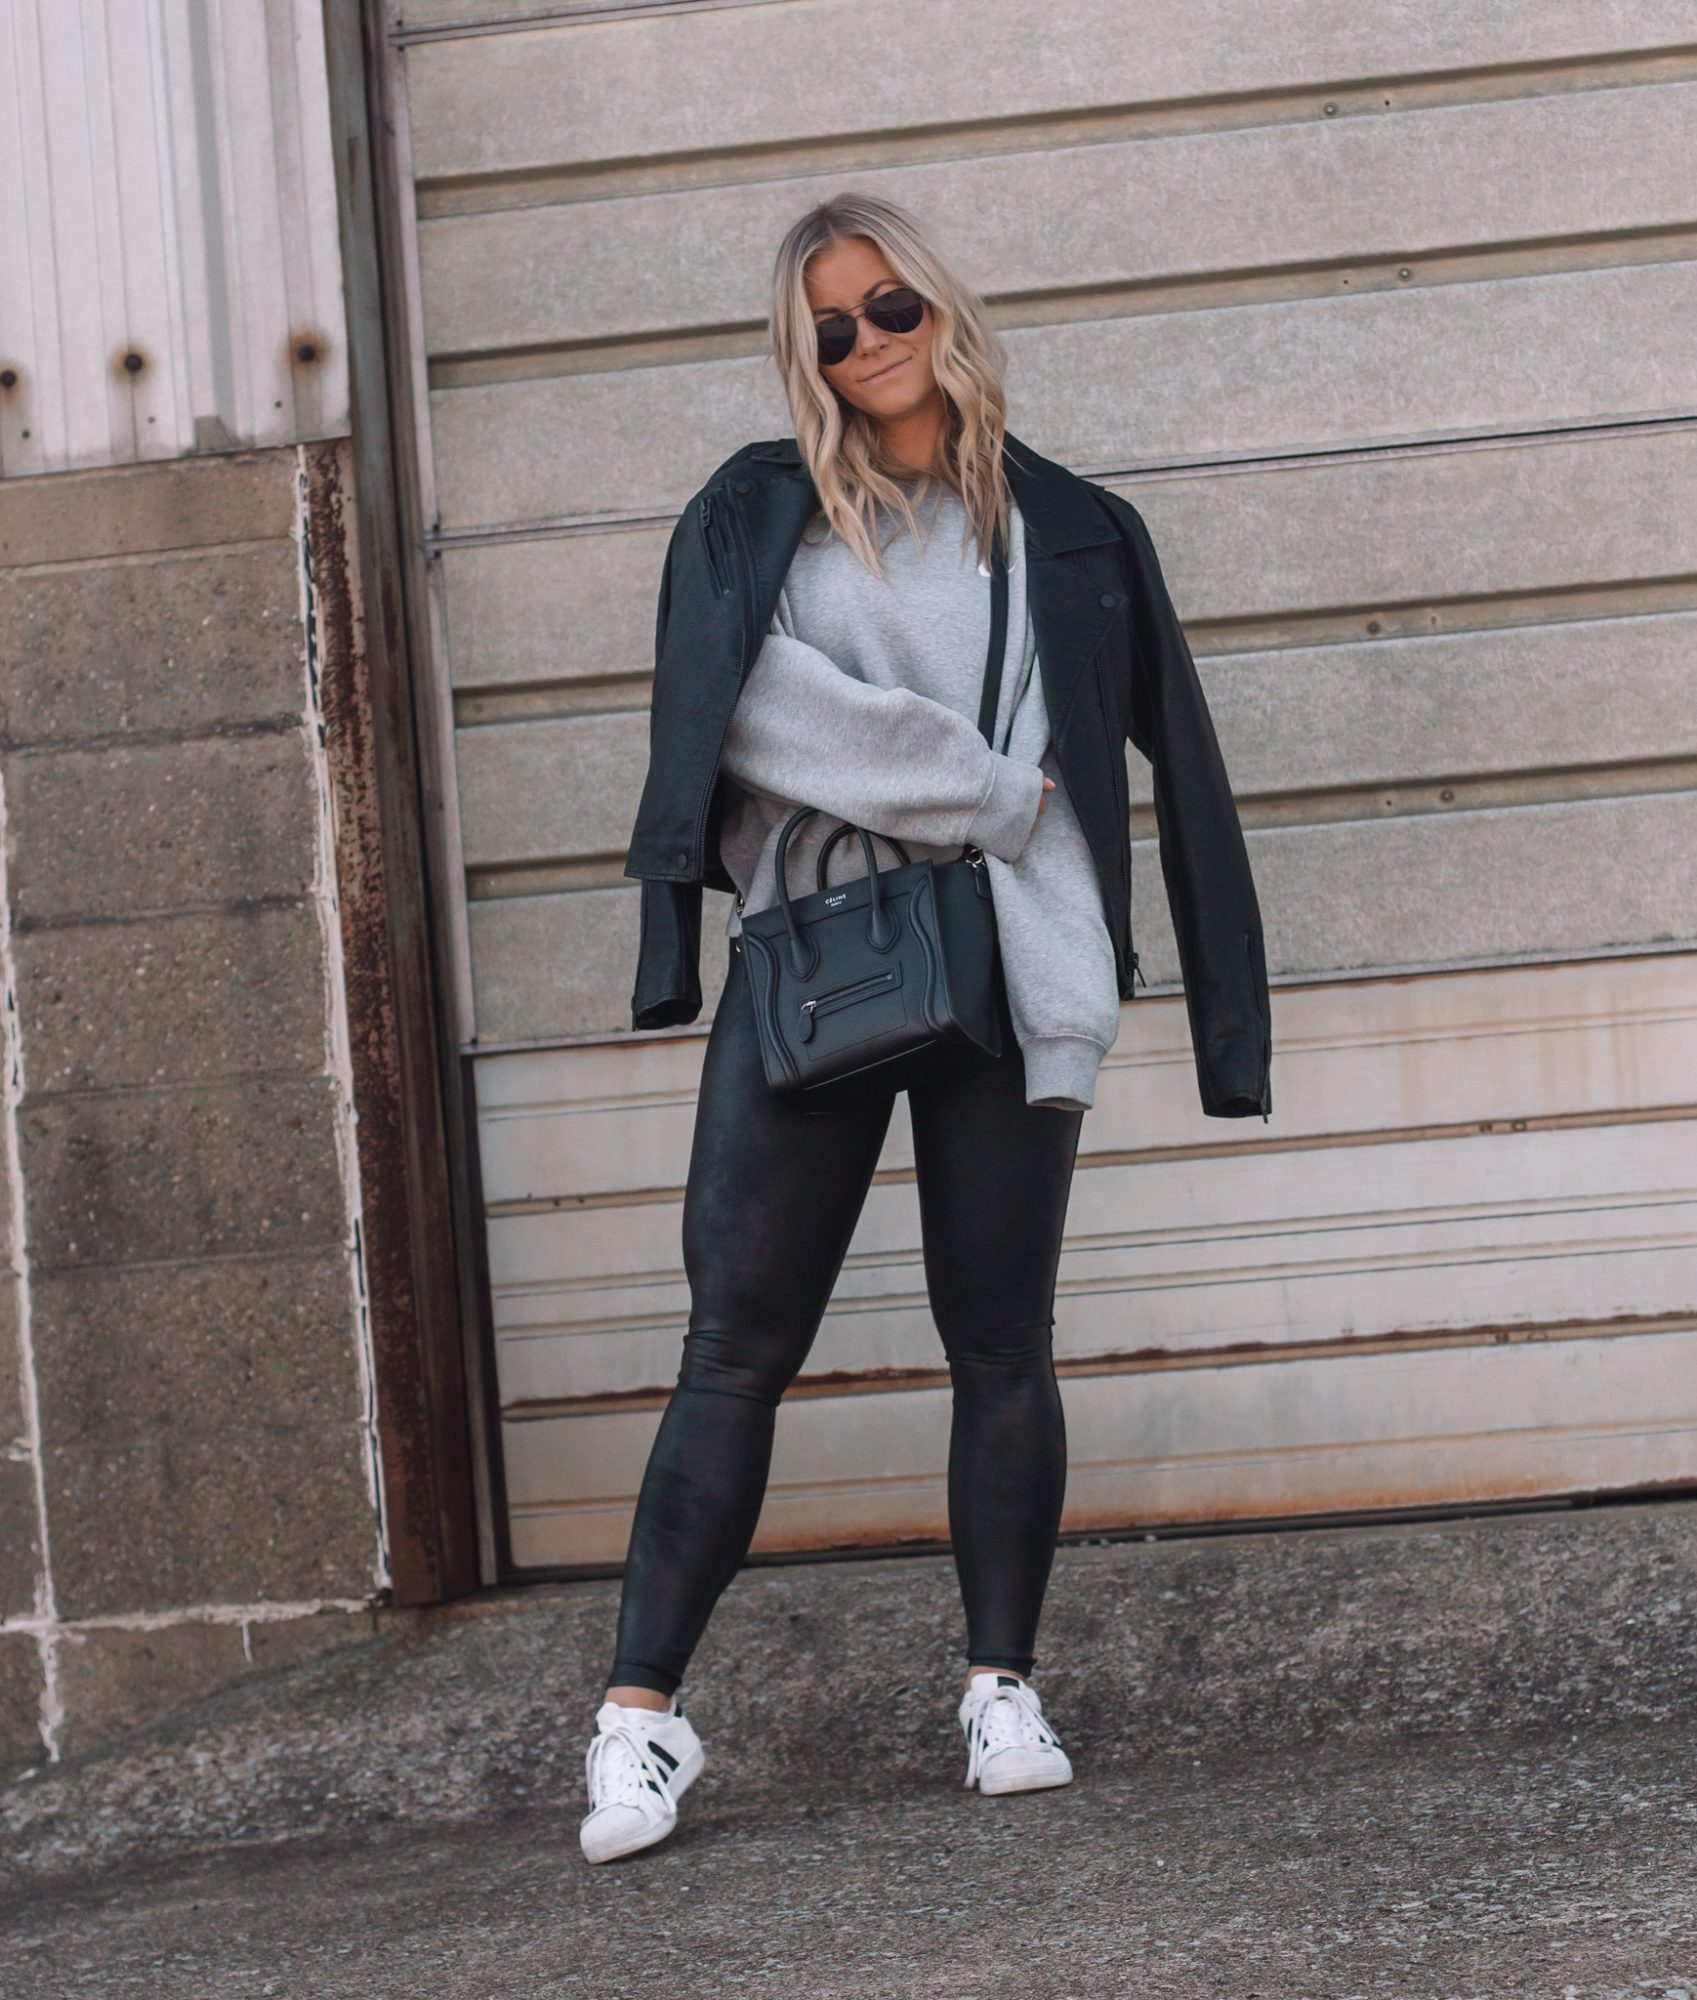 Faux Leather Leggings - Fall Outfit Idea- Athleisure- Ashley Pletcher